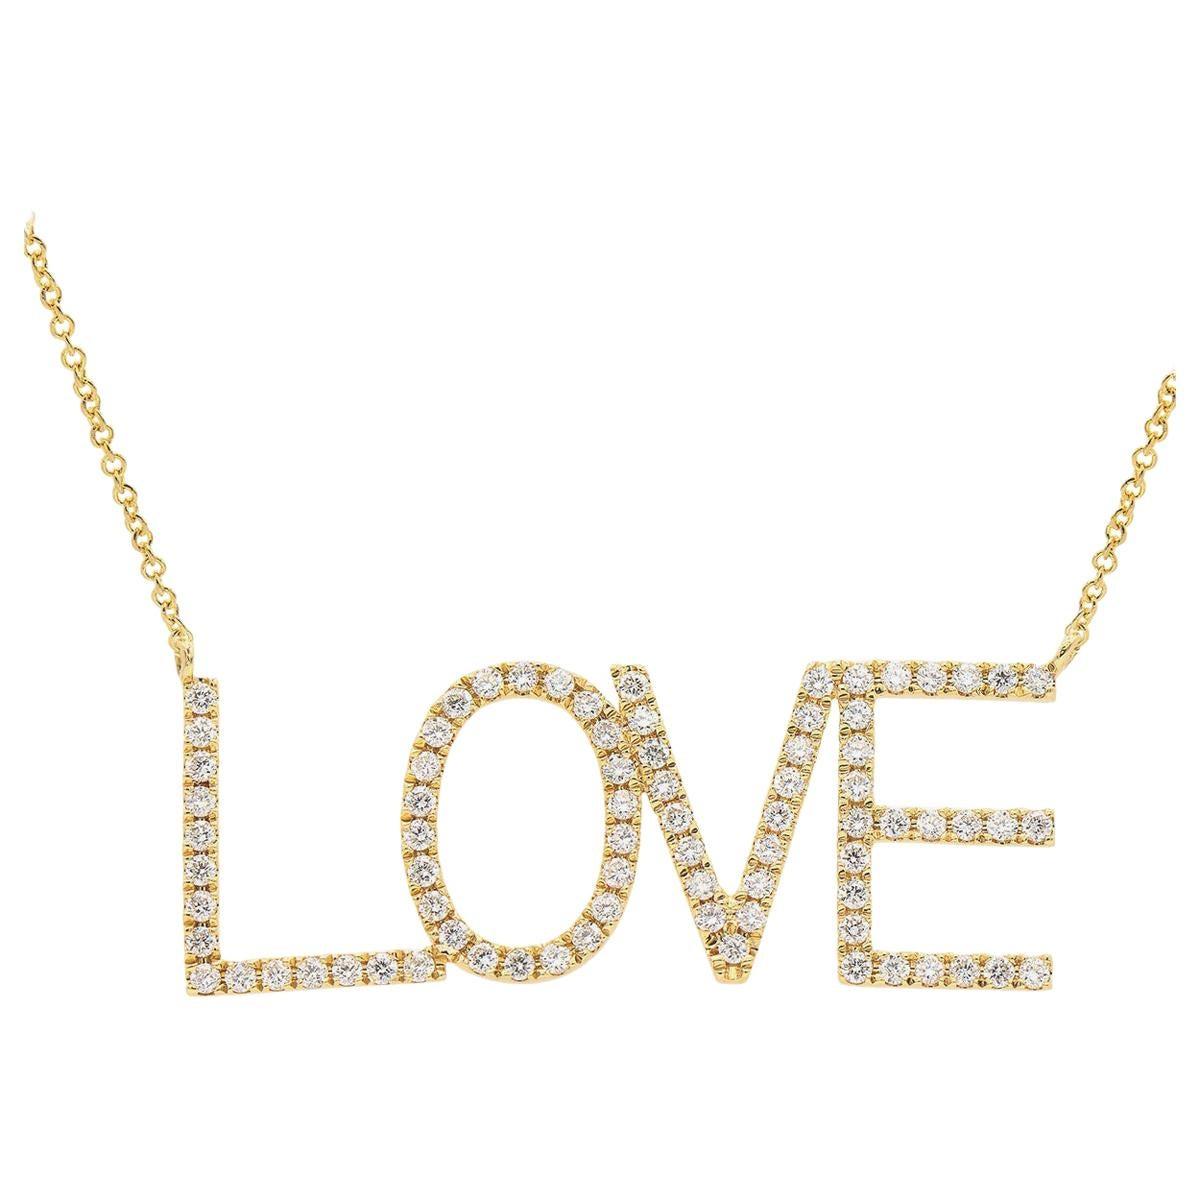 18 Karat Yellow Gold Bold LOVE Necklace